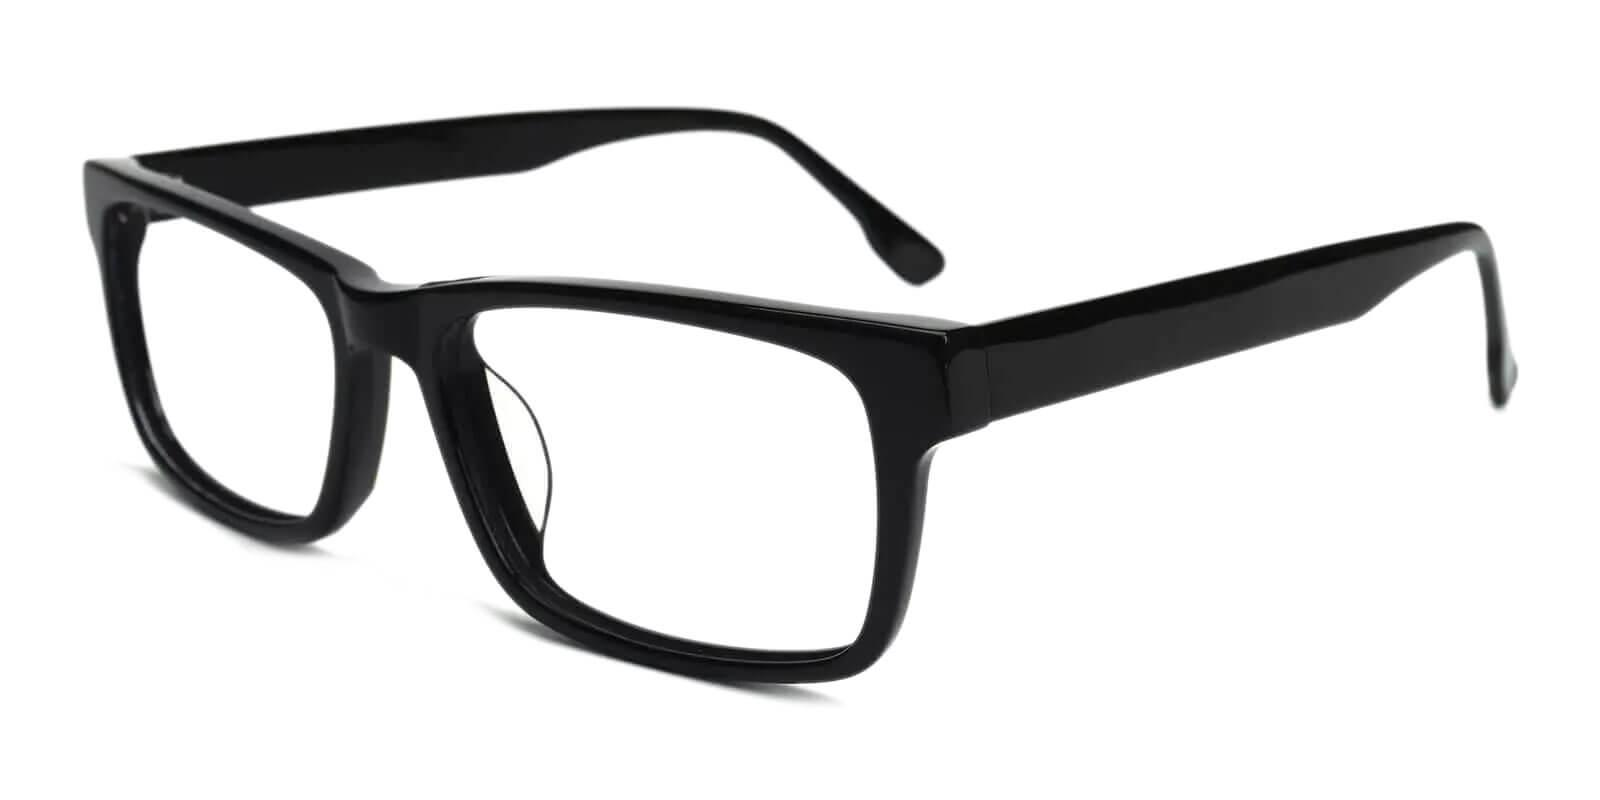 Mineral Wells Black Acetate Eyeglasses , UniversalBridgeFit Frames from ABBE Glasses